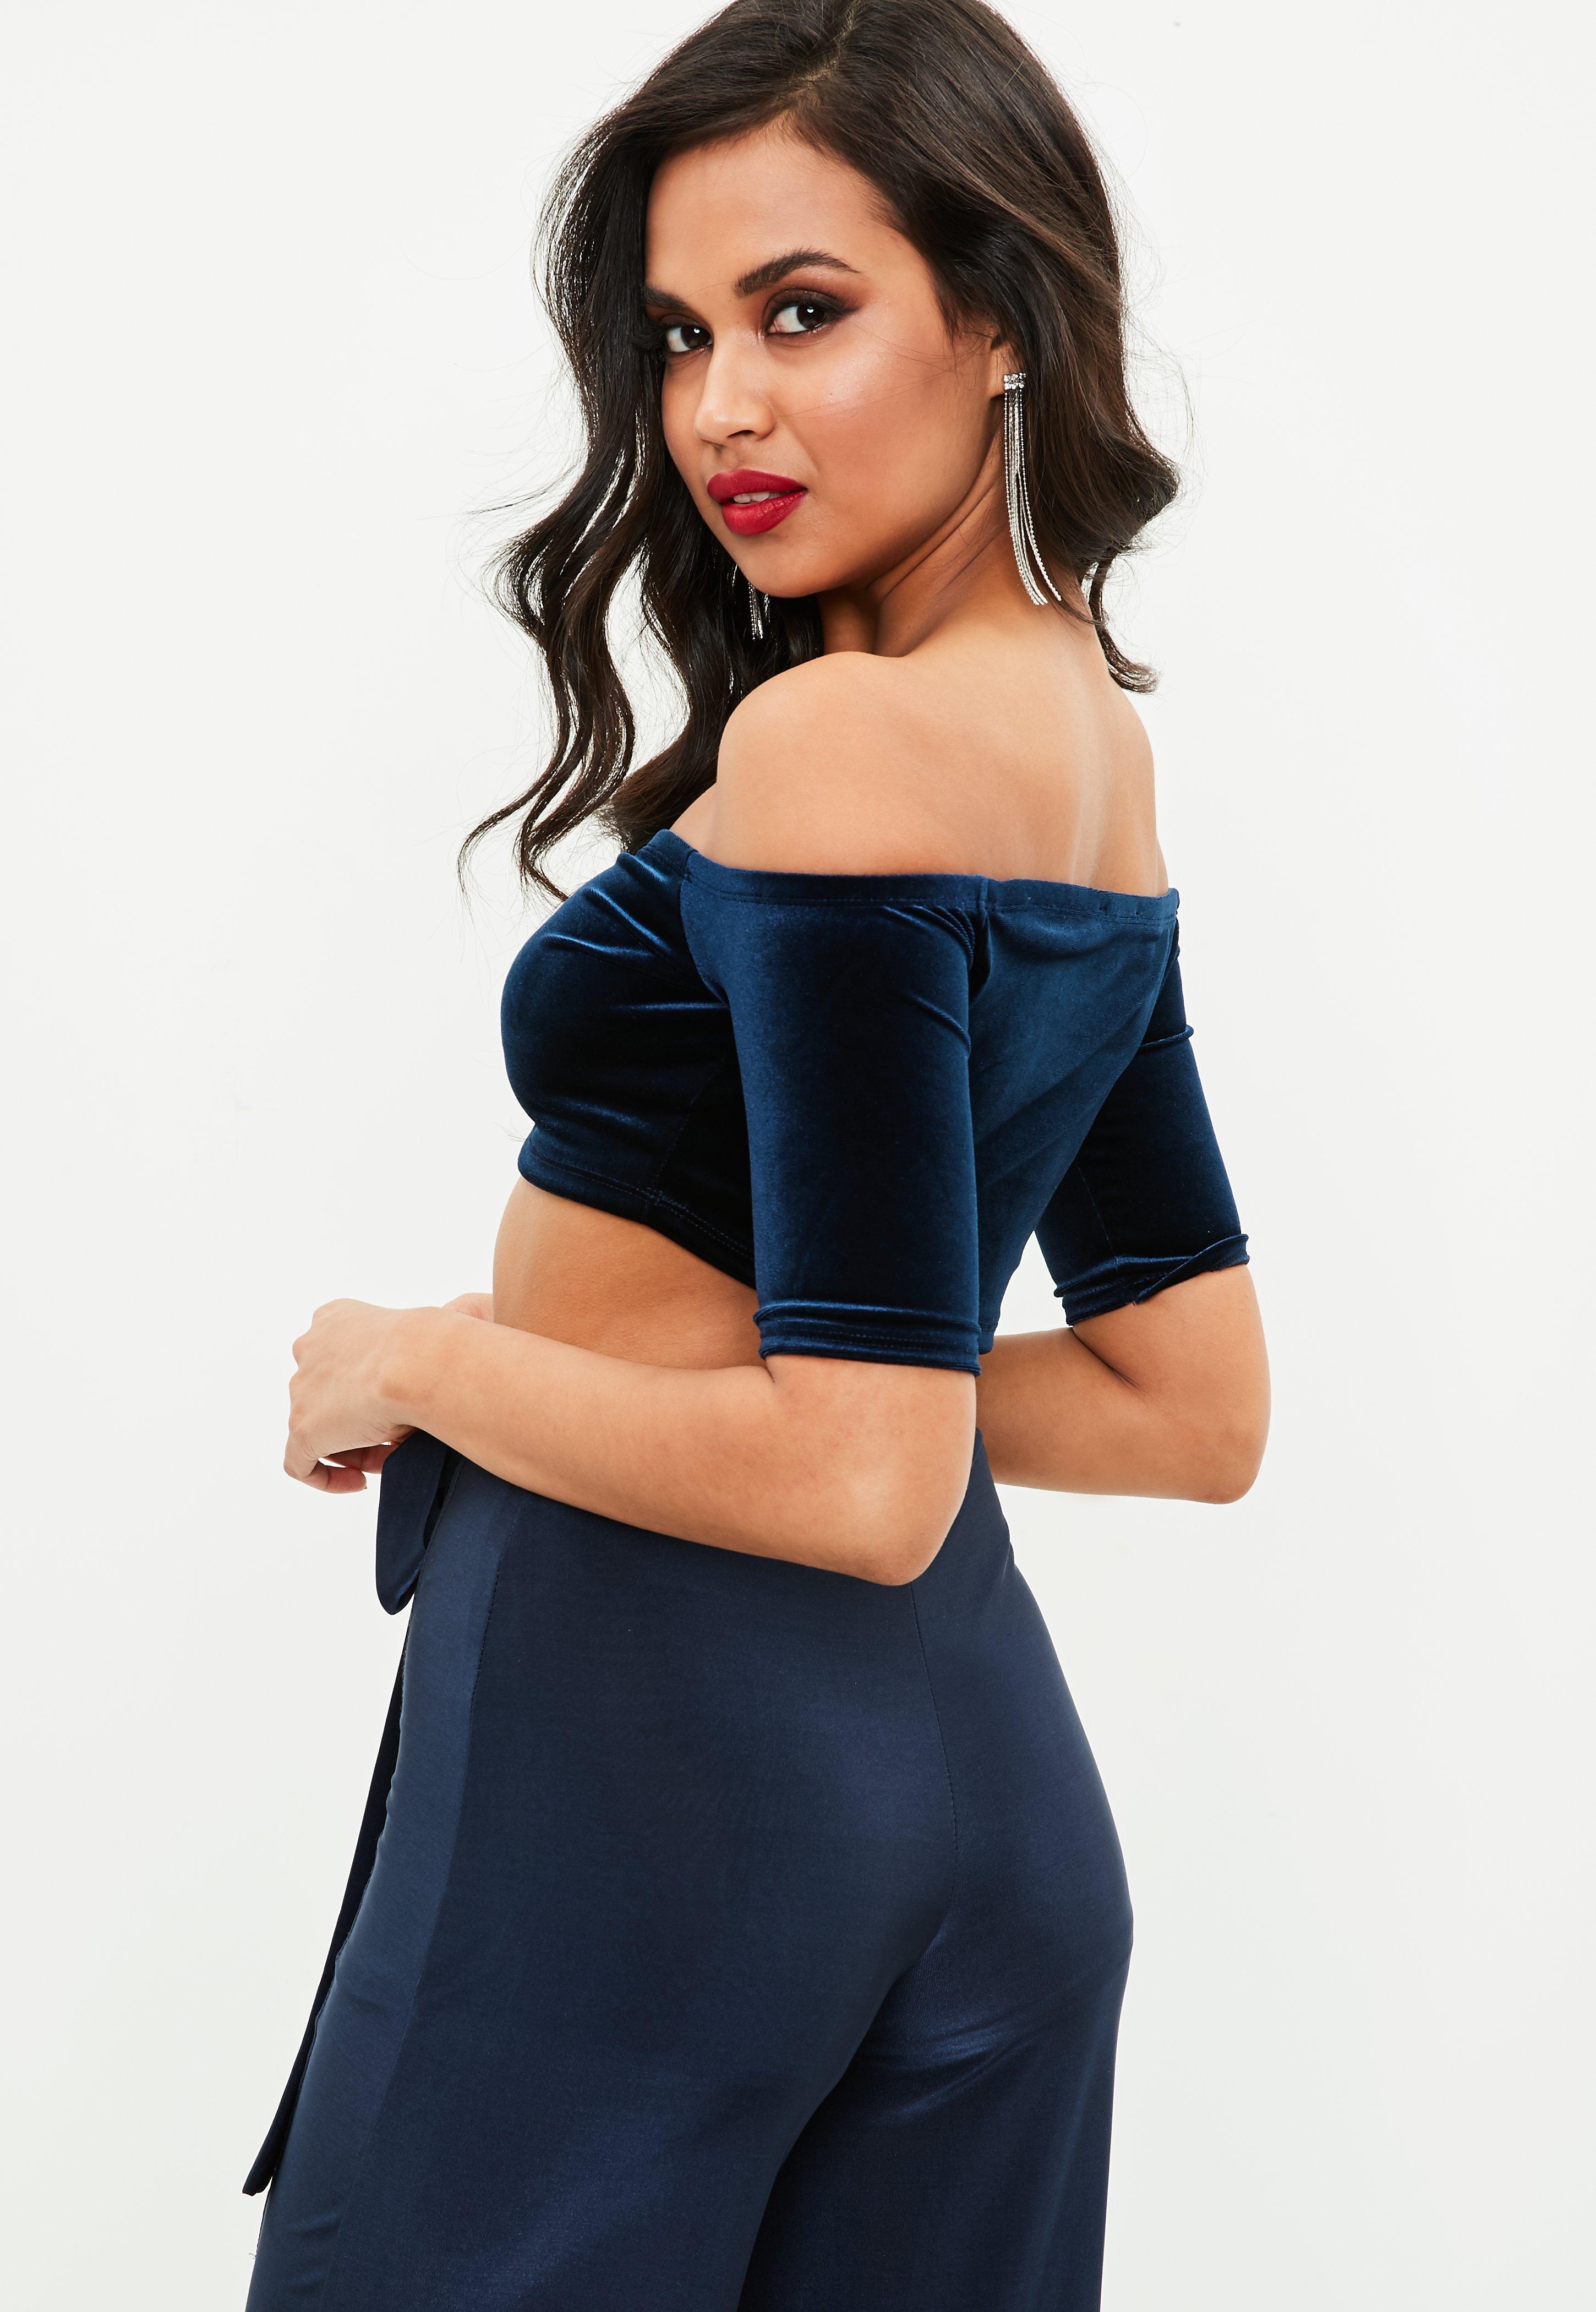 b6b467170c27c Lyst - Missguided Navy Velvet Ruched Bardot Crop Top in Blue